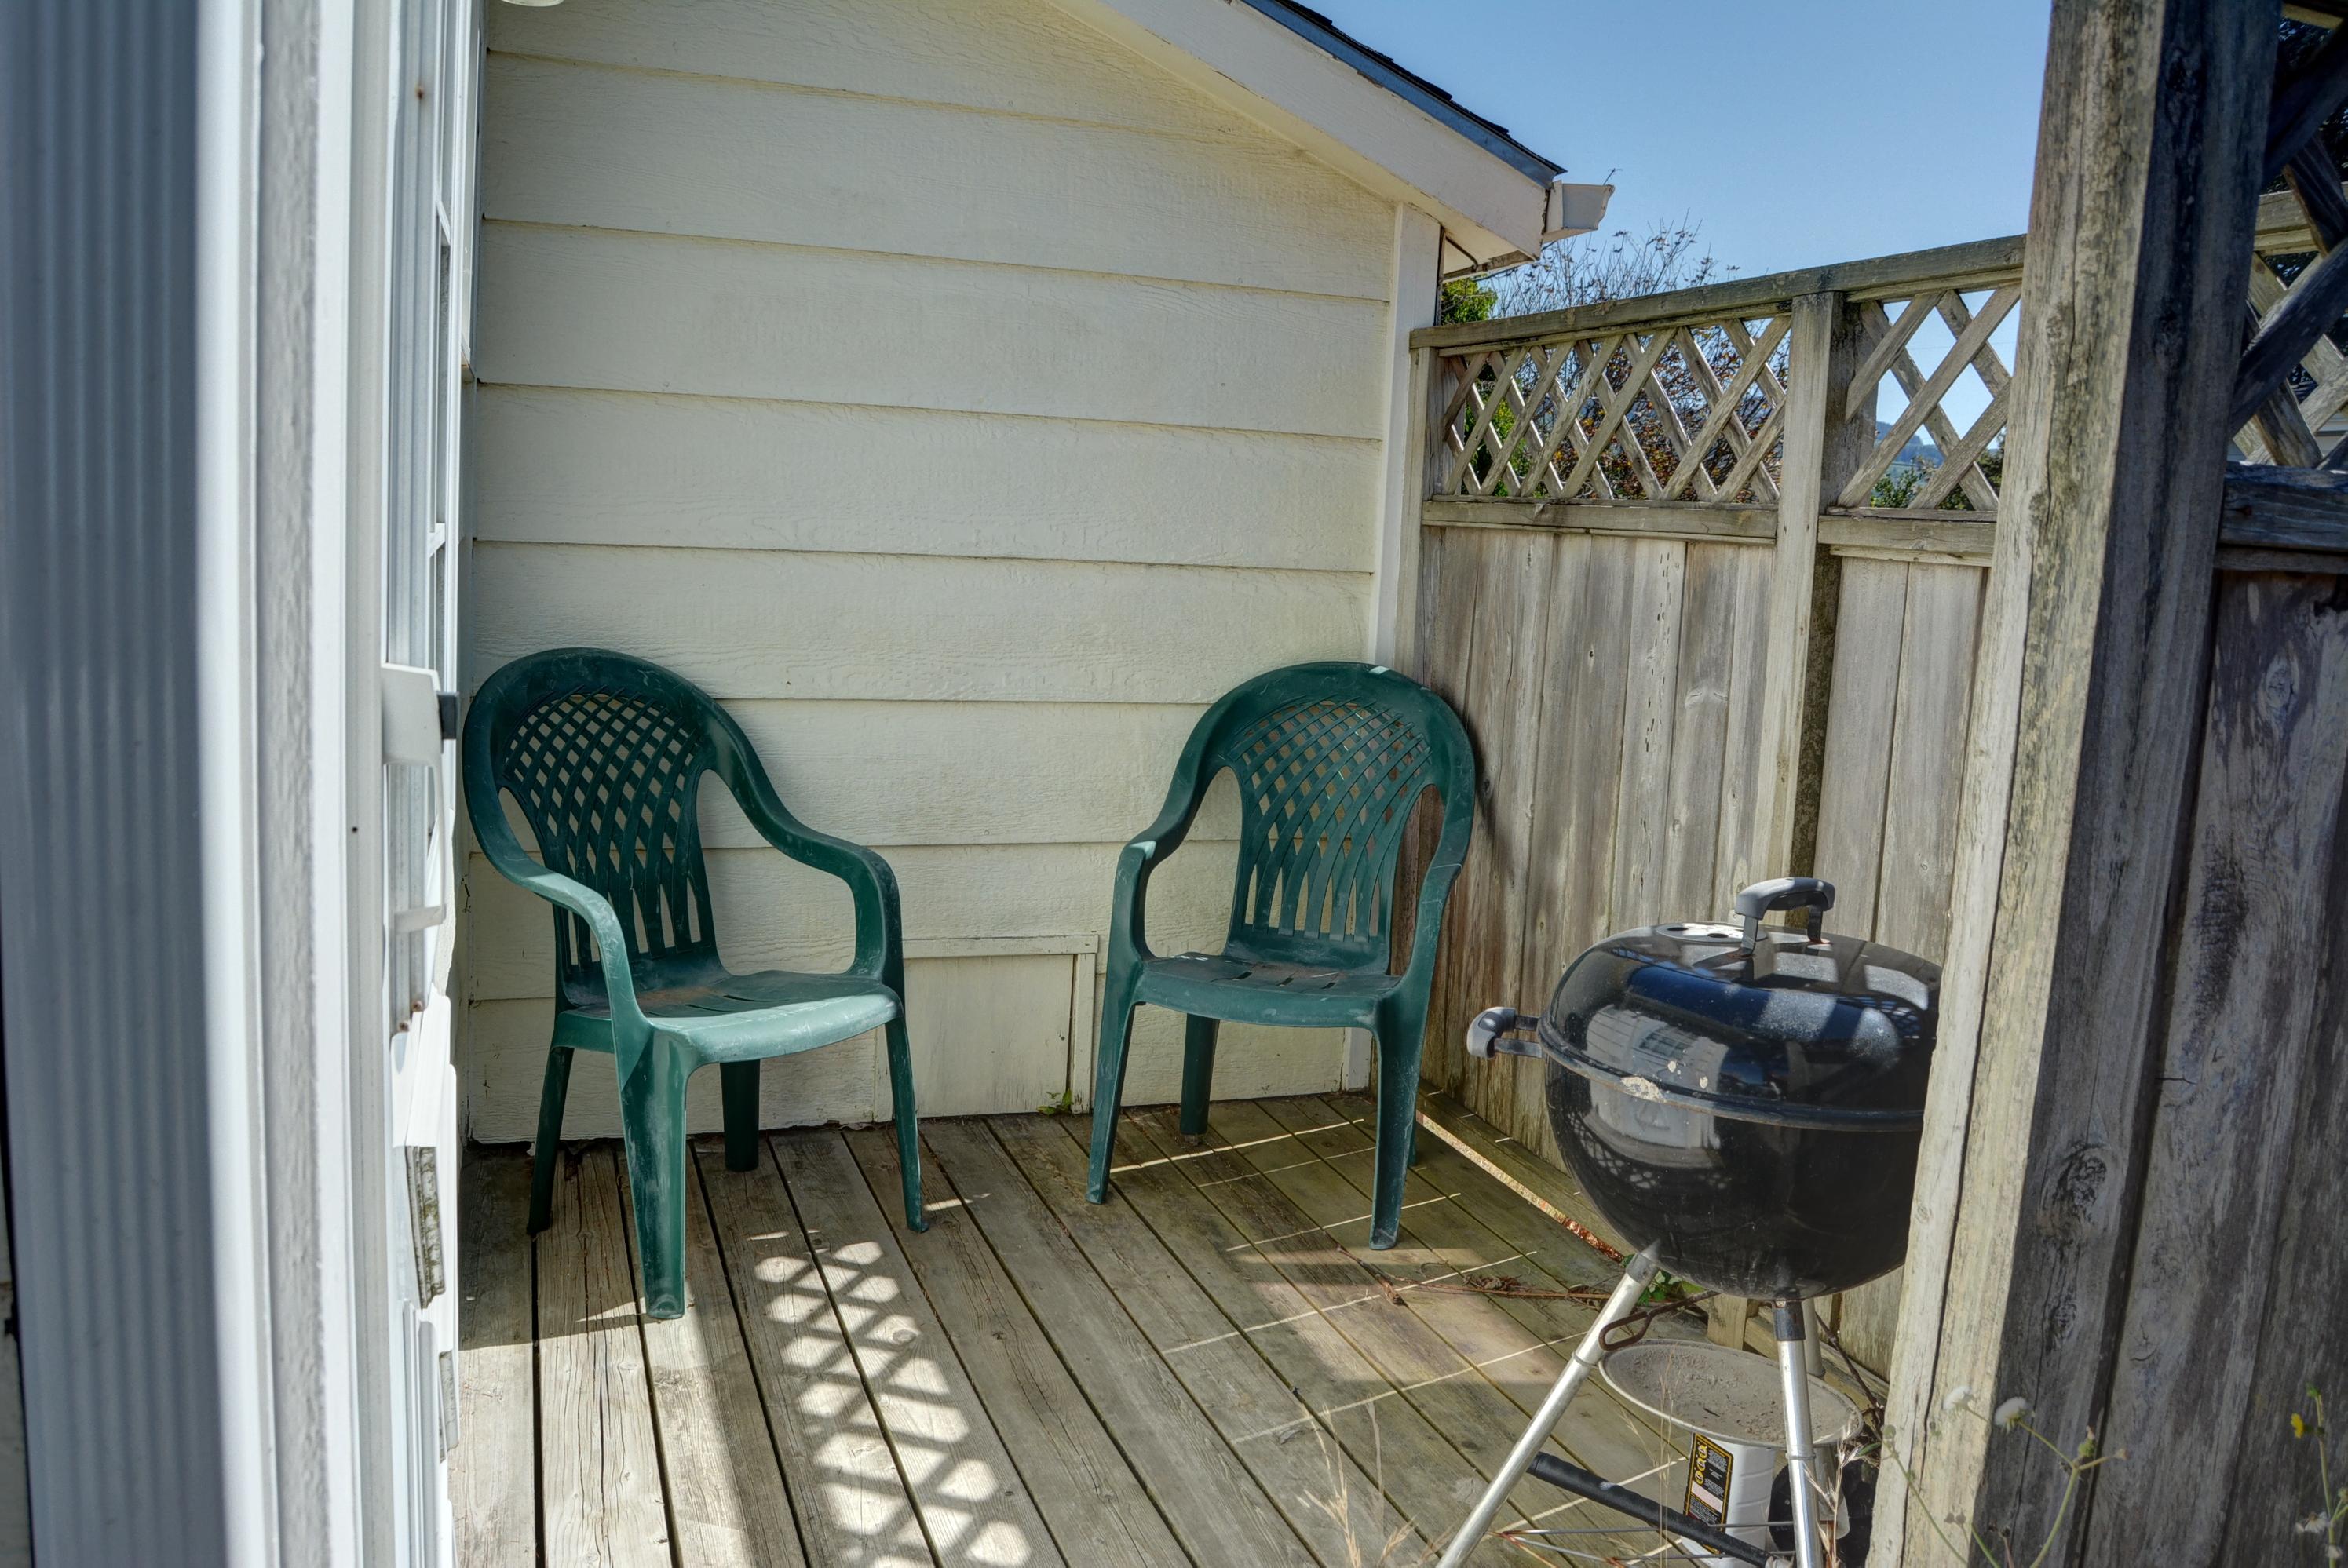 or cottage inn comforter in rental property oregon seaside sand dollar comfort vacation redawning